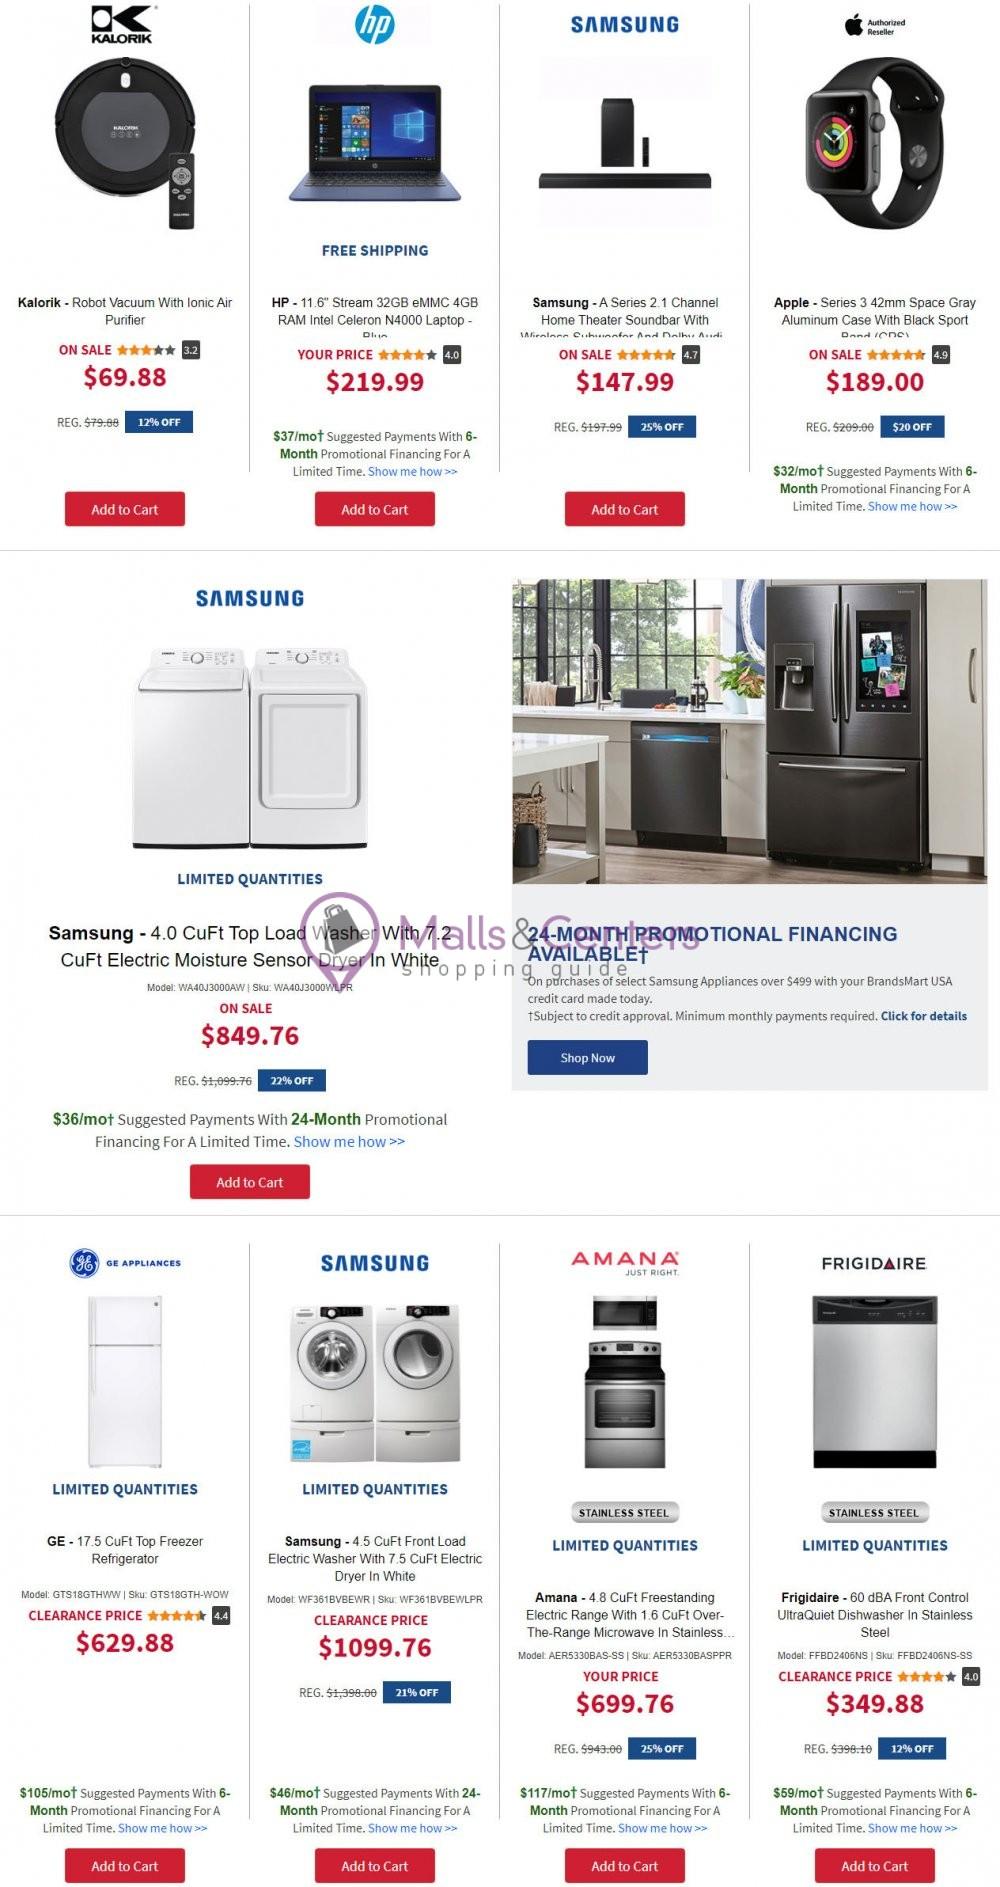 weekly ads BrandsMart USA - page 1 - mallscenters.com